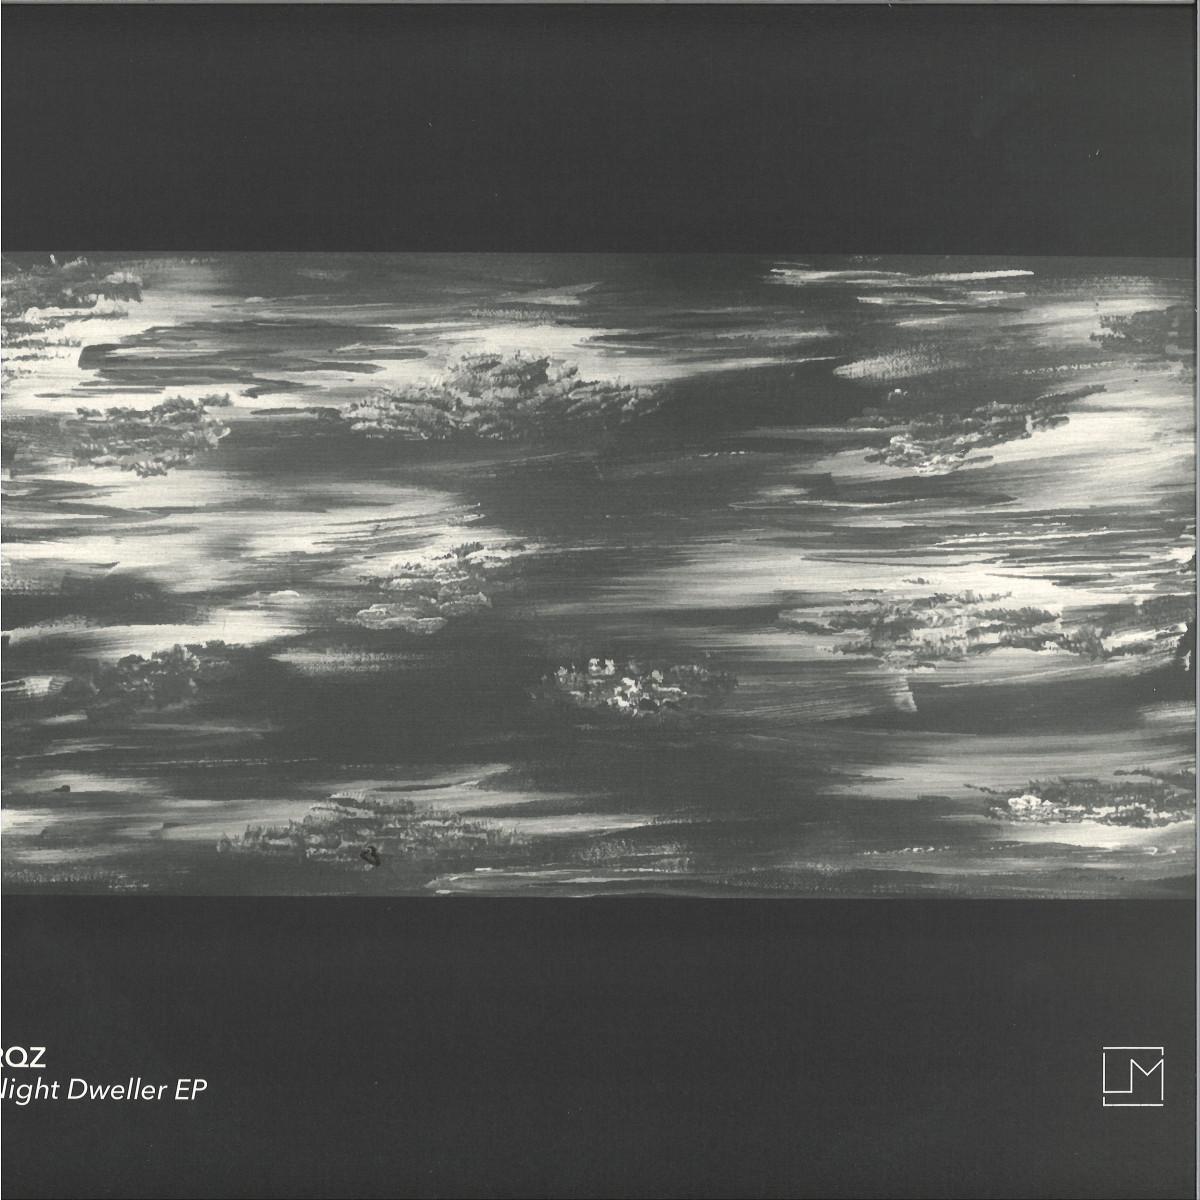 RQZ - Night Dweller EP [Untitled Musica]